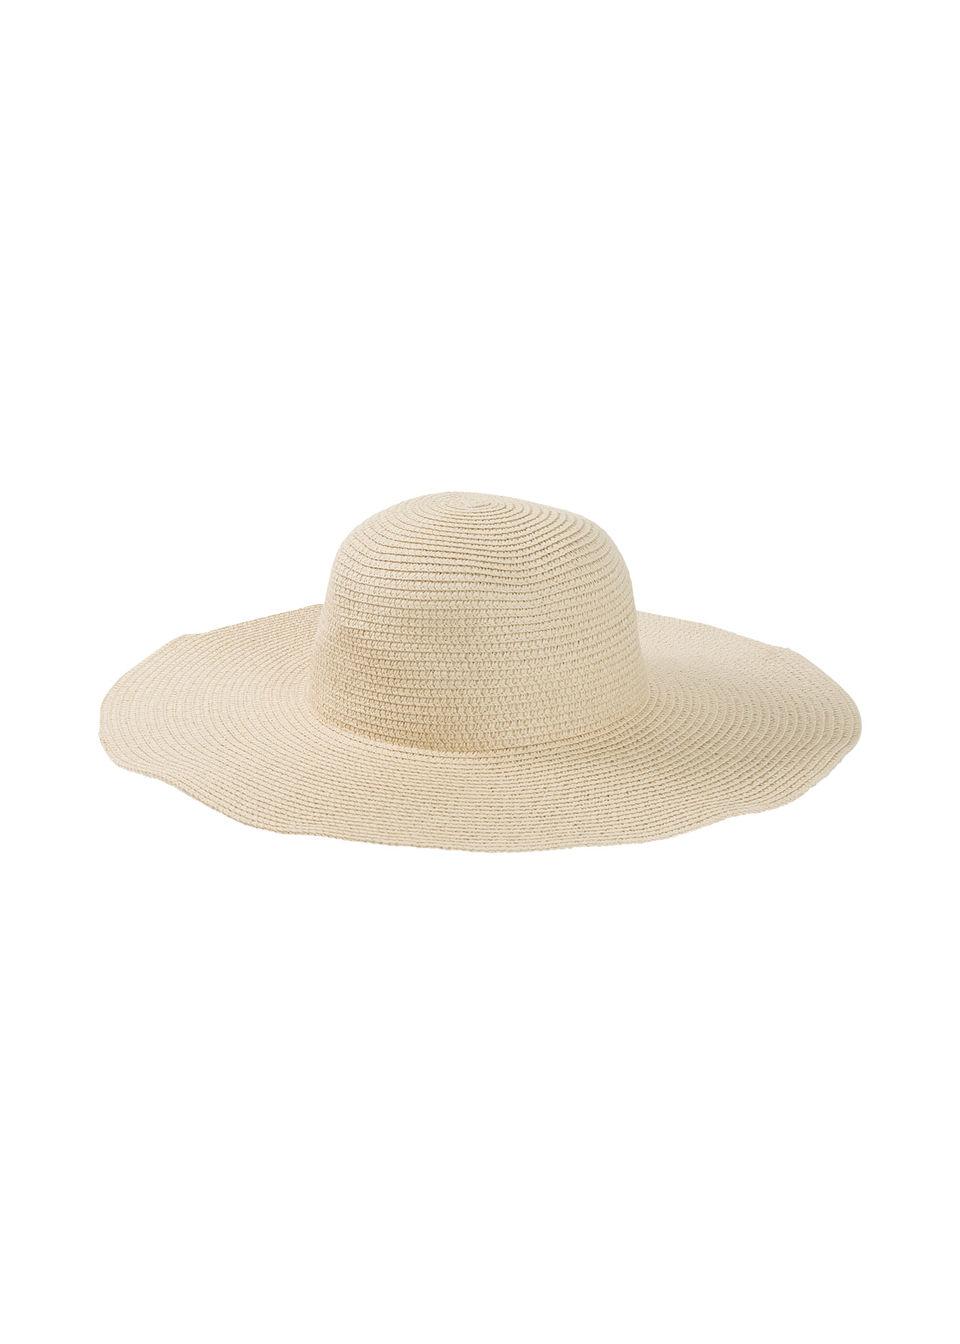 b5278ce2c Slamené klobúky, klobuky na leto, damsky klobucik, letné klobúky ...